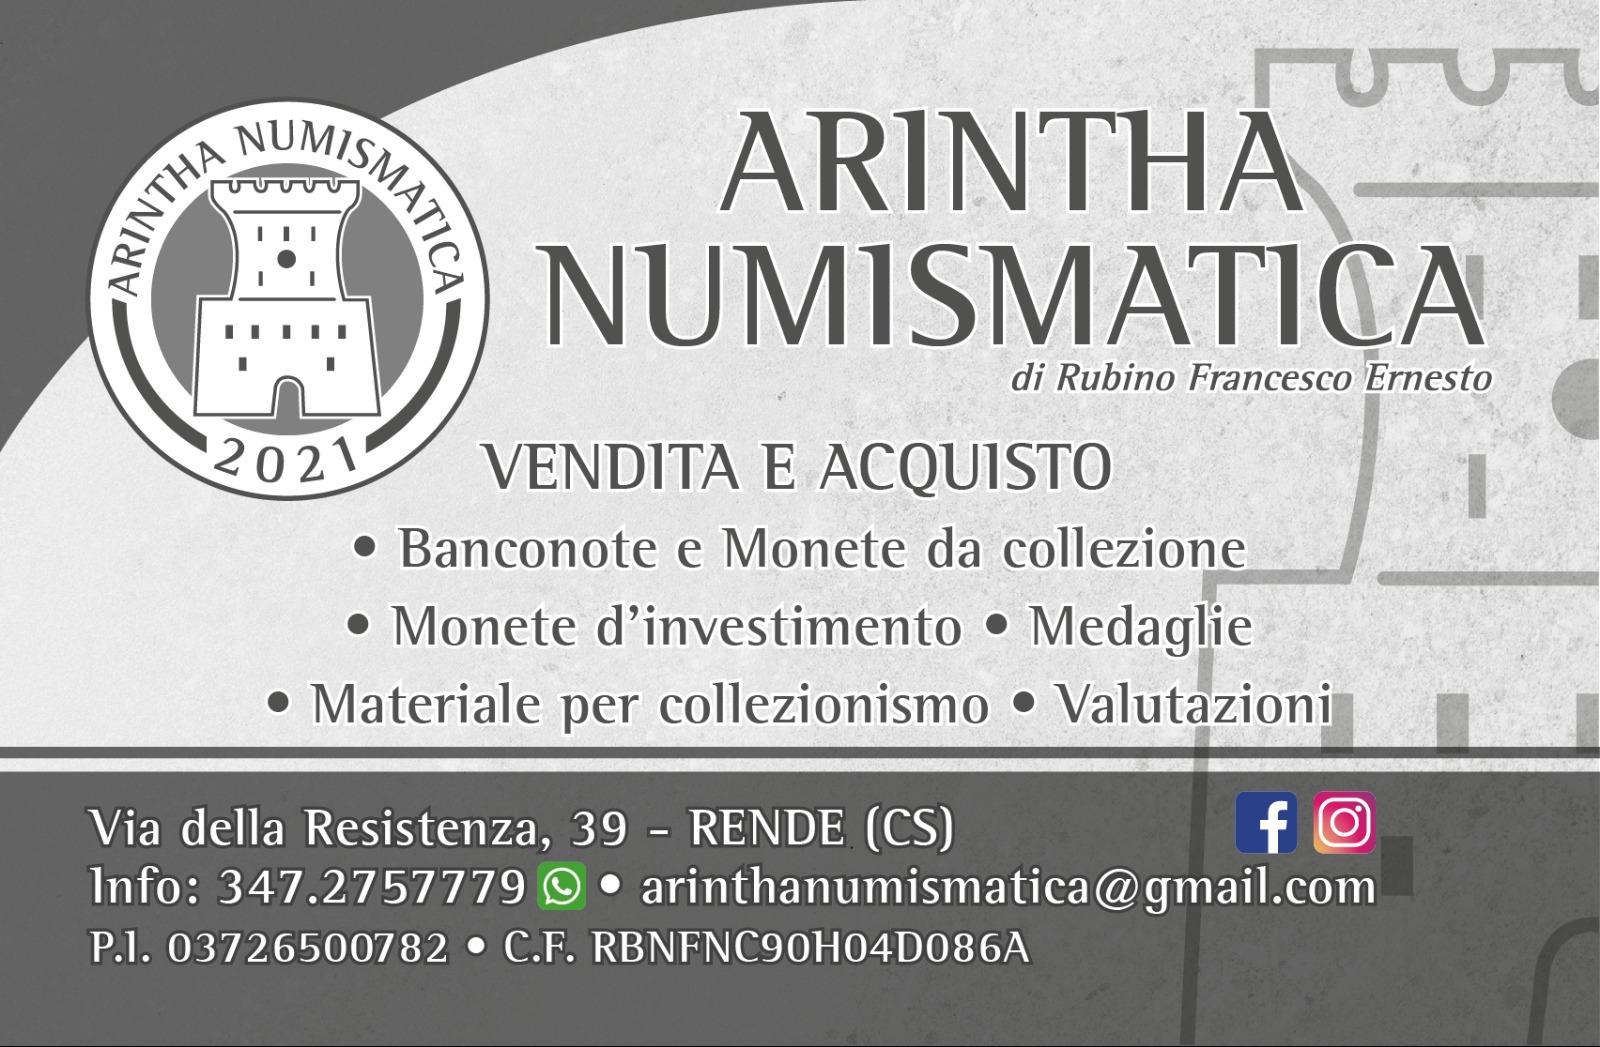 Nuova inaugurazione a Rende: apre Arintha Numismatica